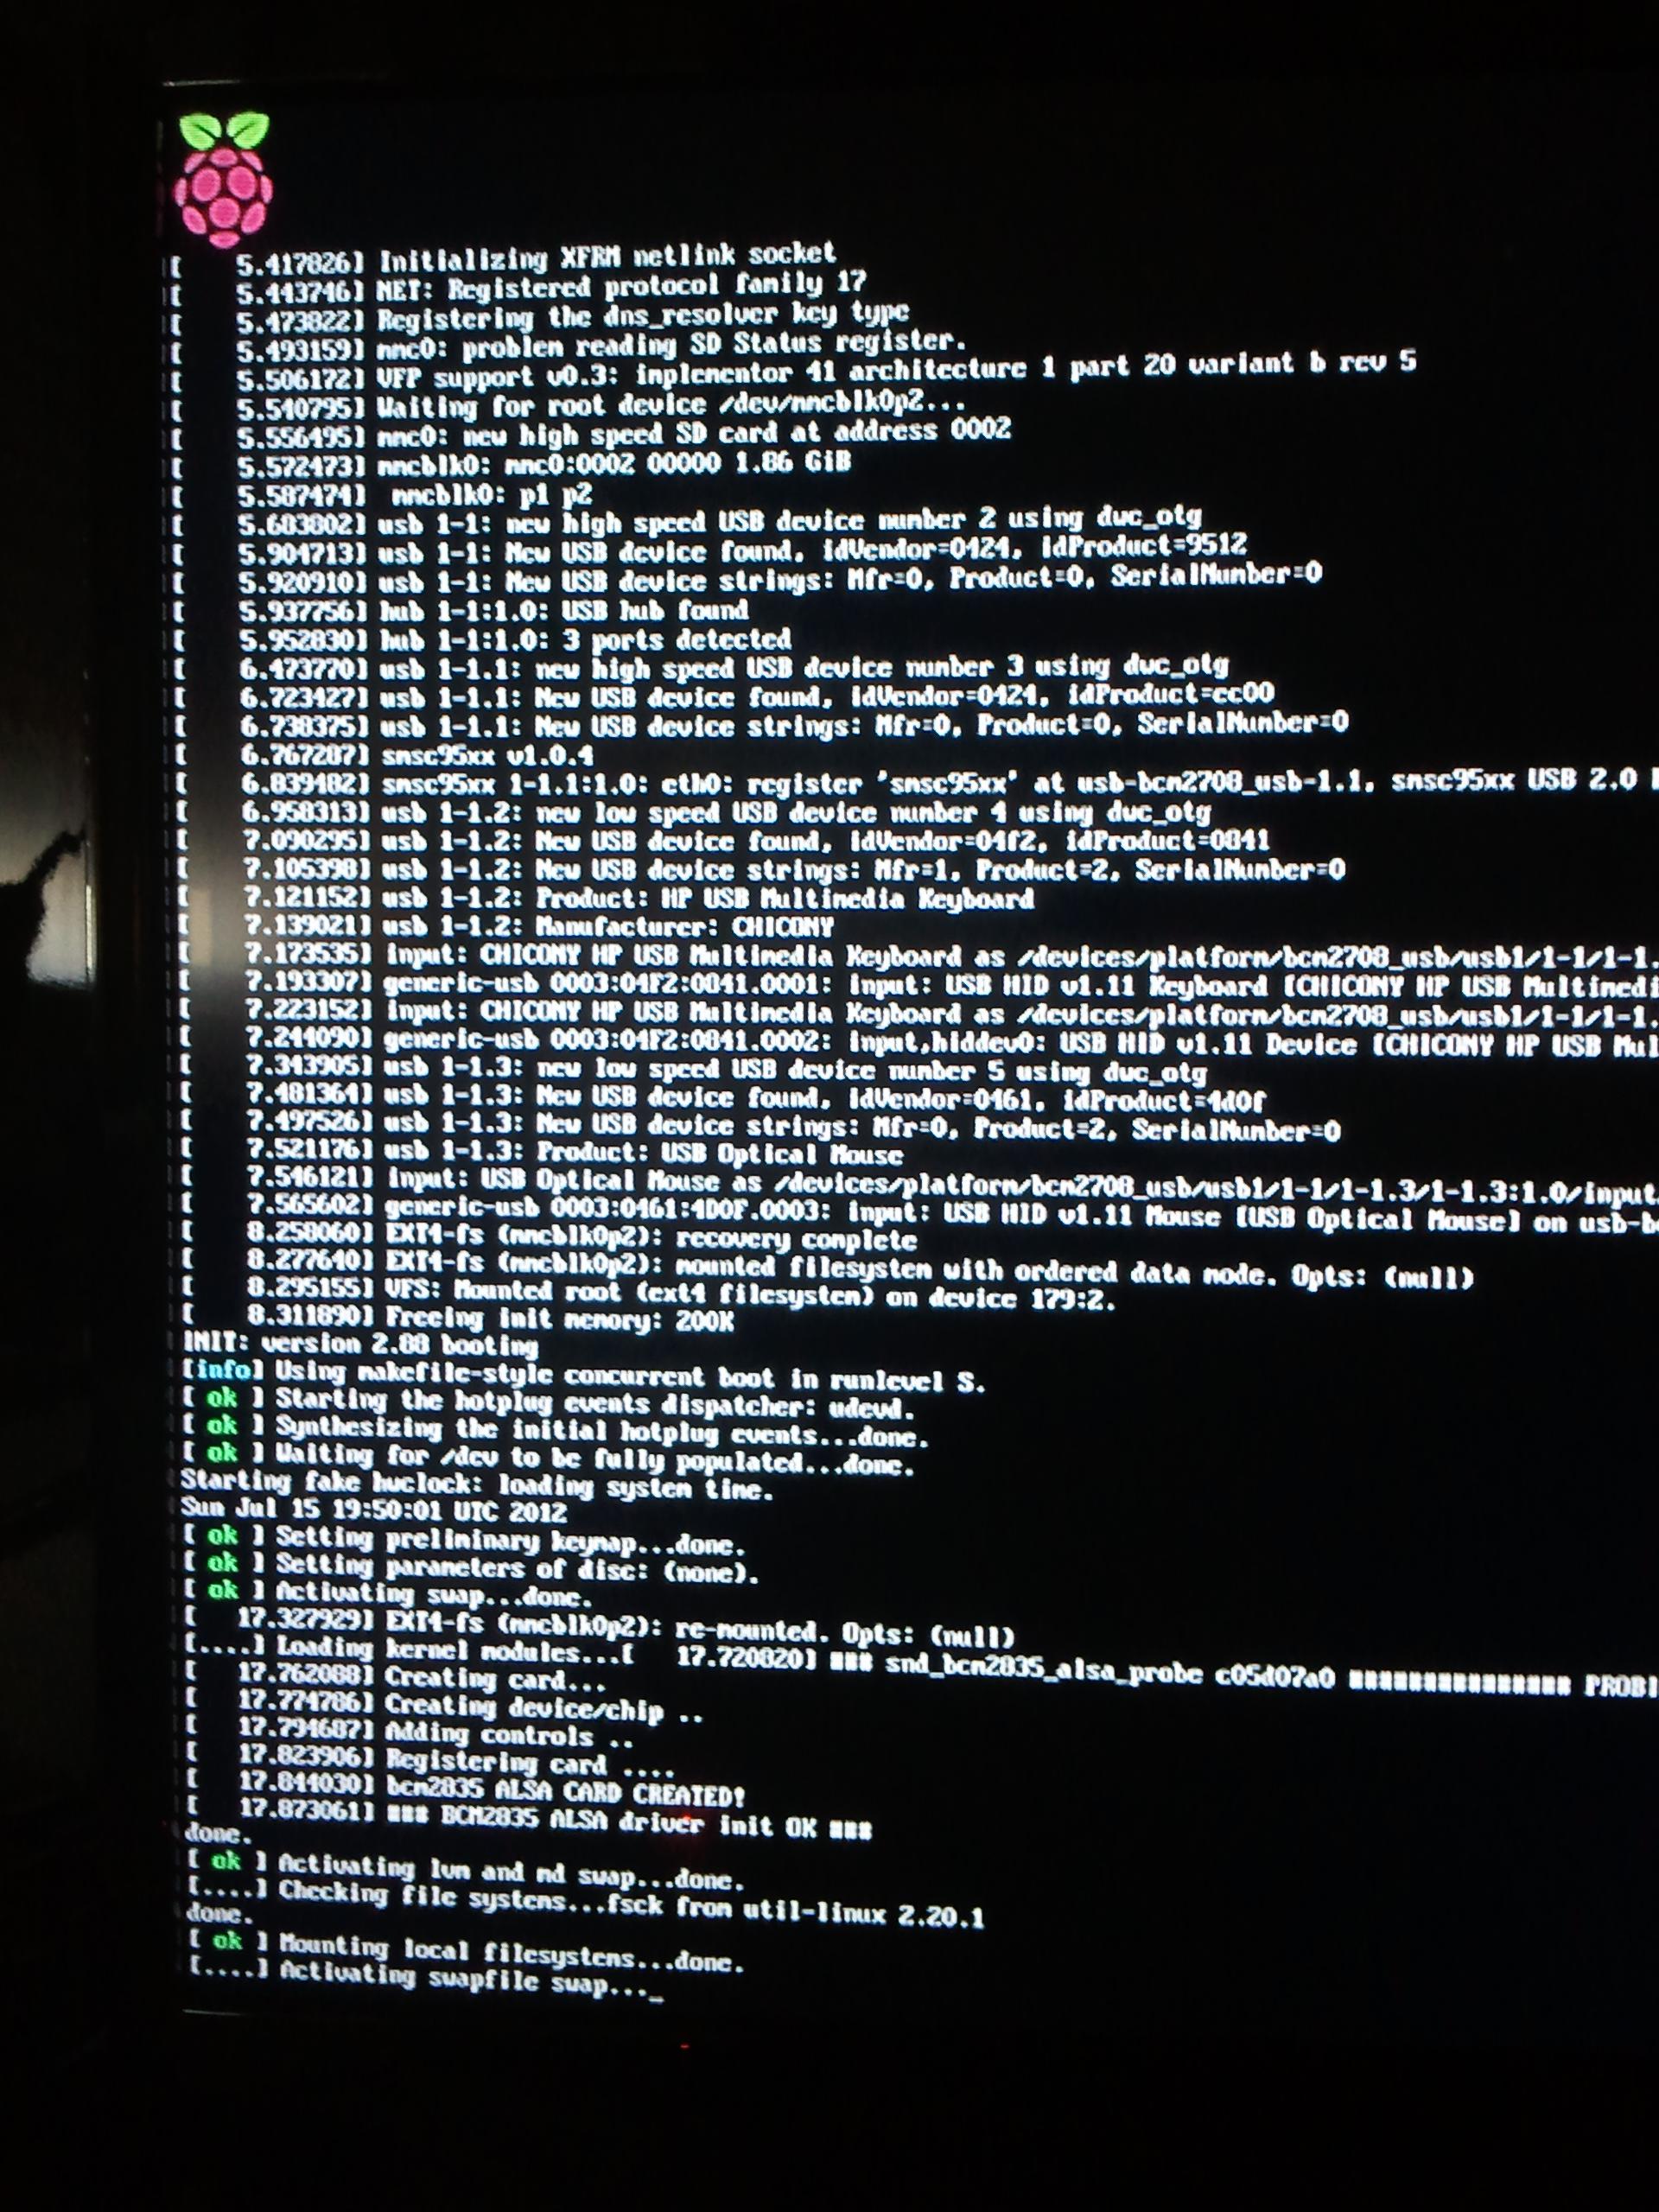 Immagini da Raspberry Pi: Raspbian 3